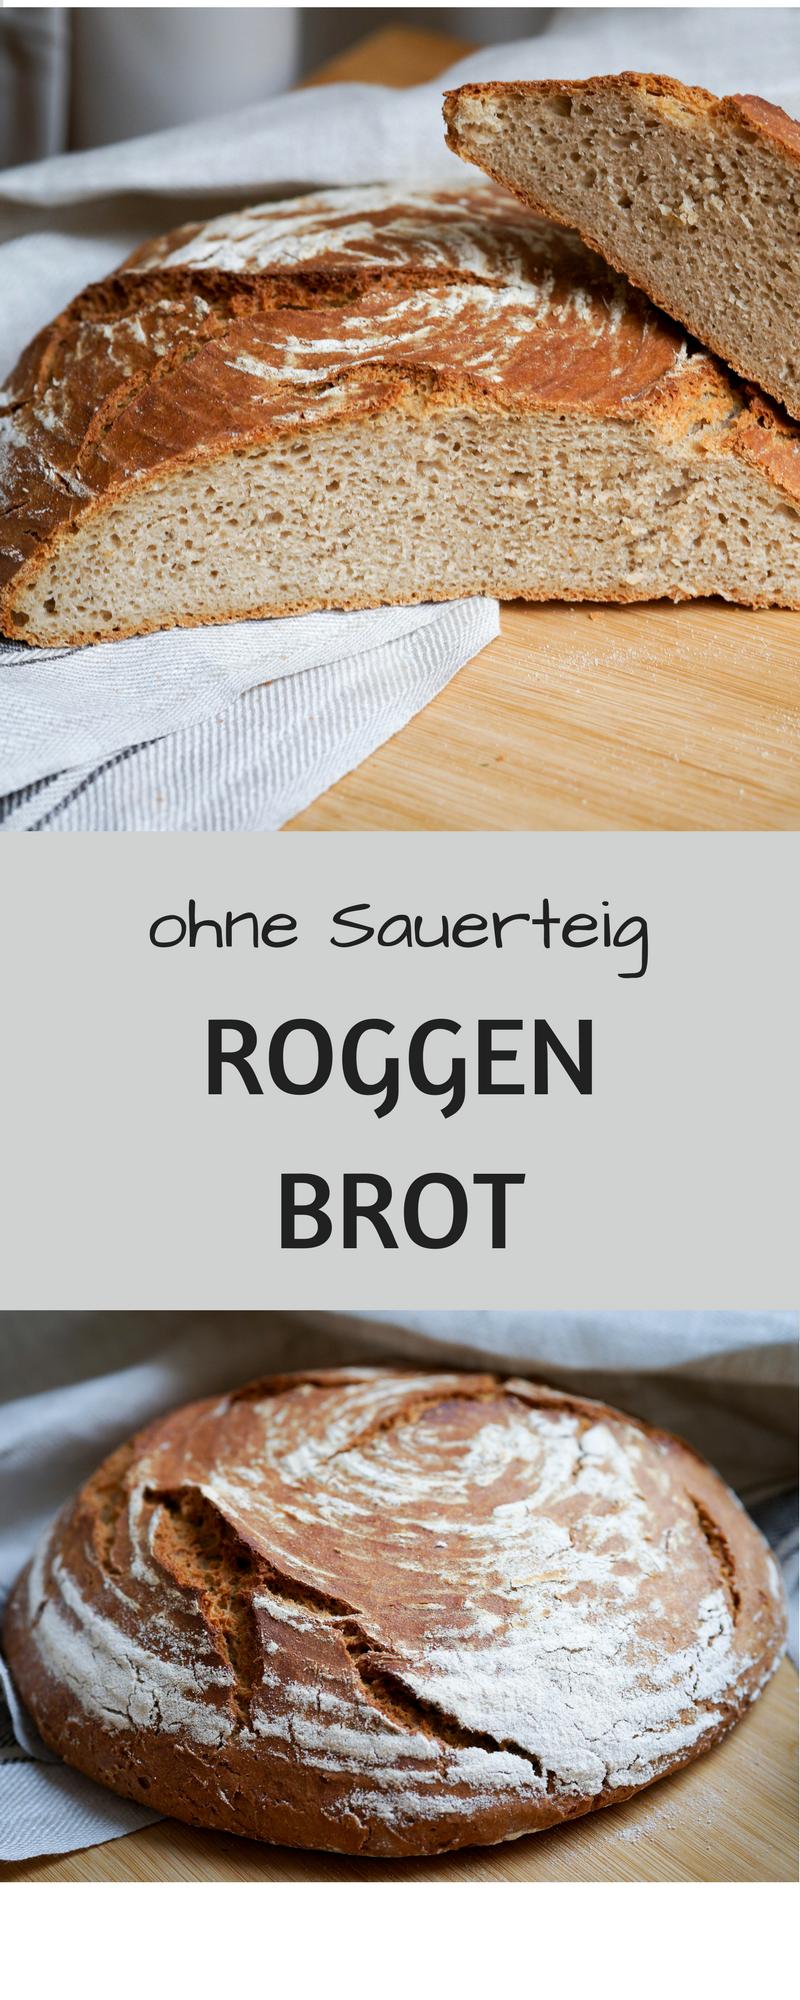 Bauernbrot ohne Sauerteig - FoodForFamily  Brot selber backen